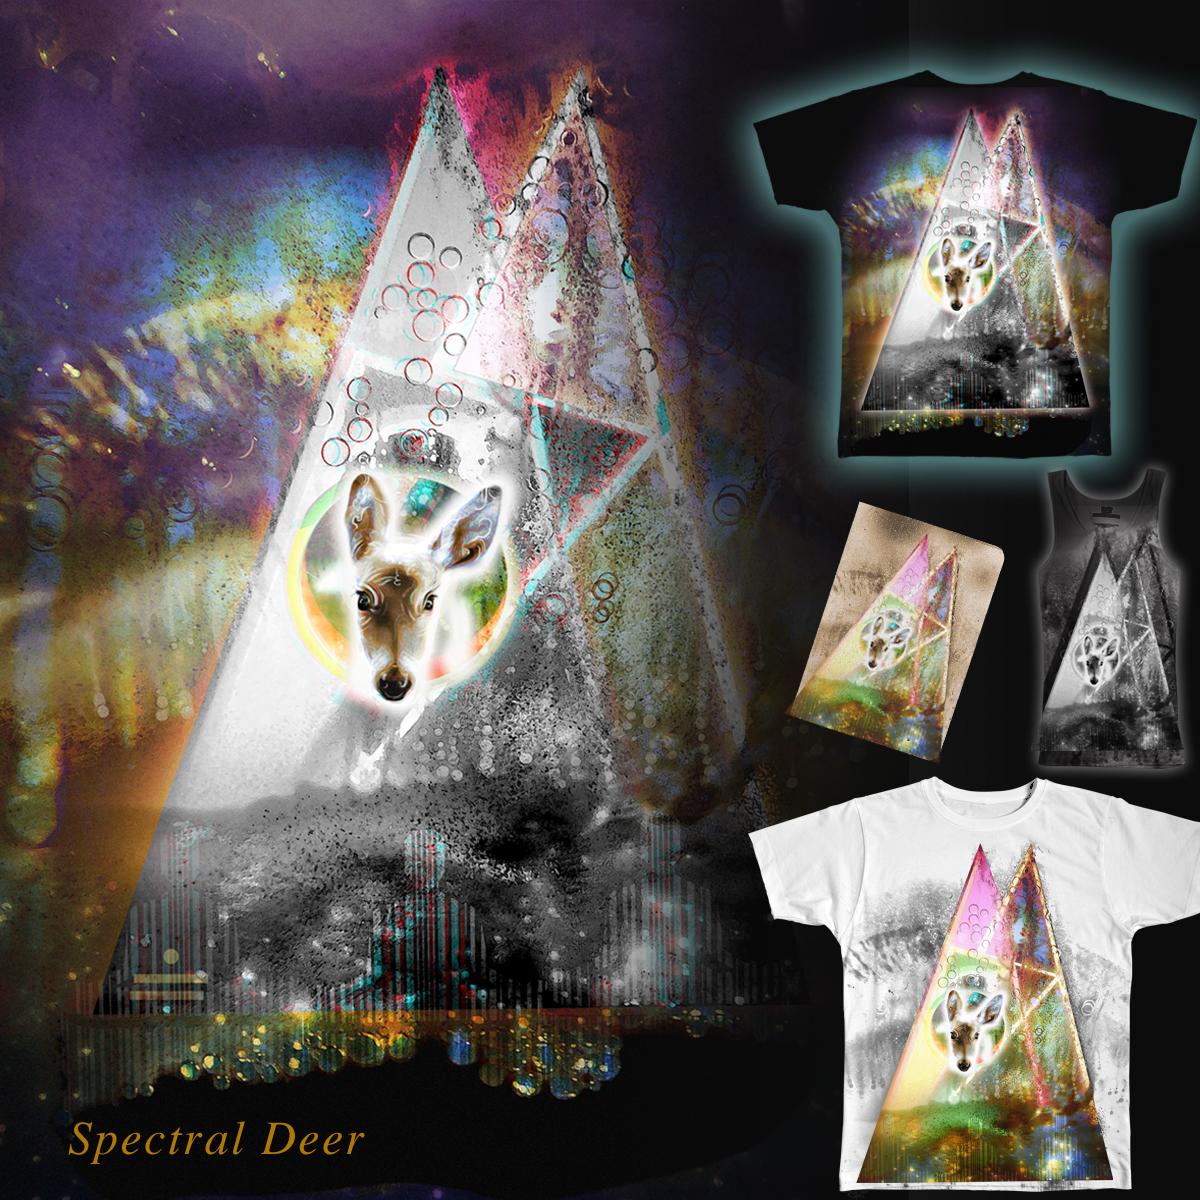 Spectral Deer by iChiTreeSign on Threadless